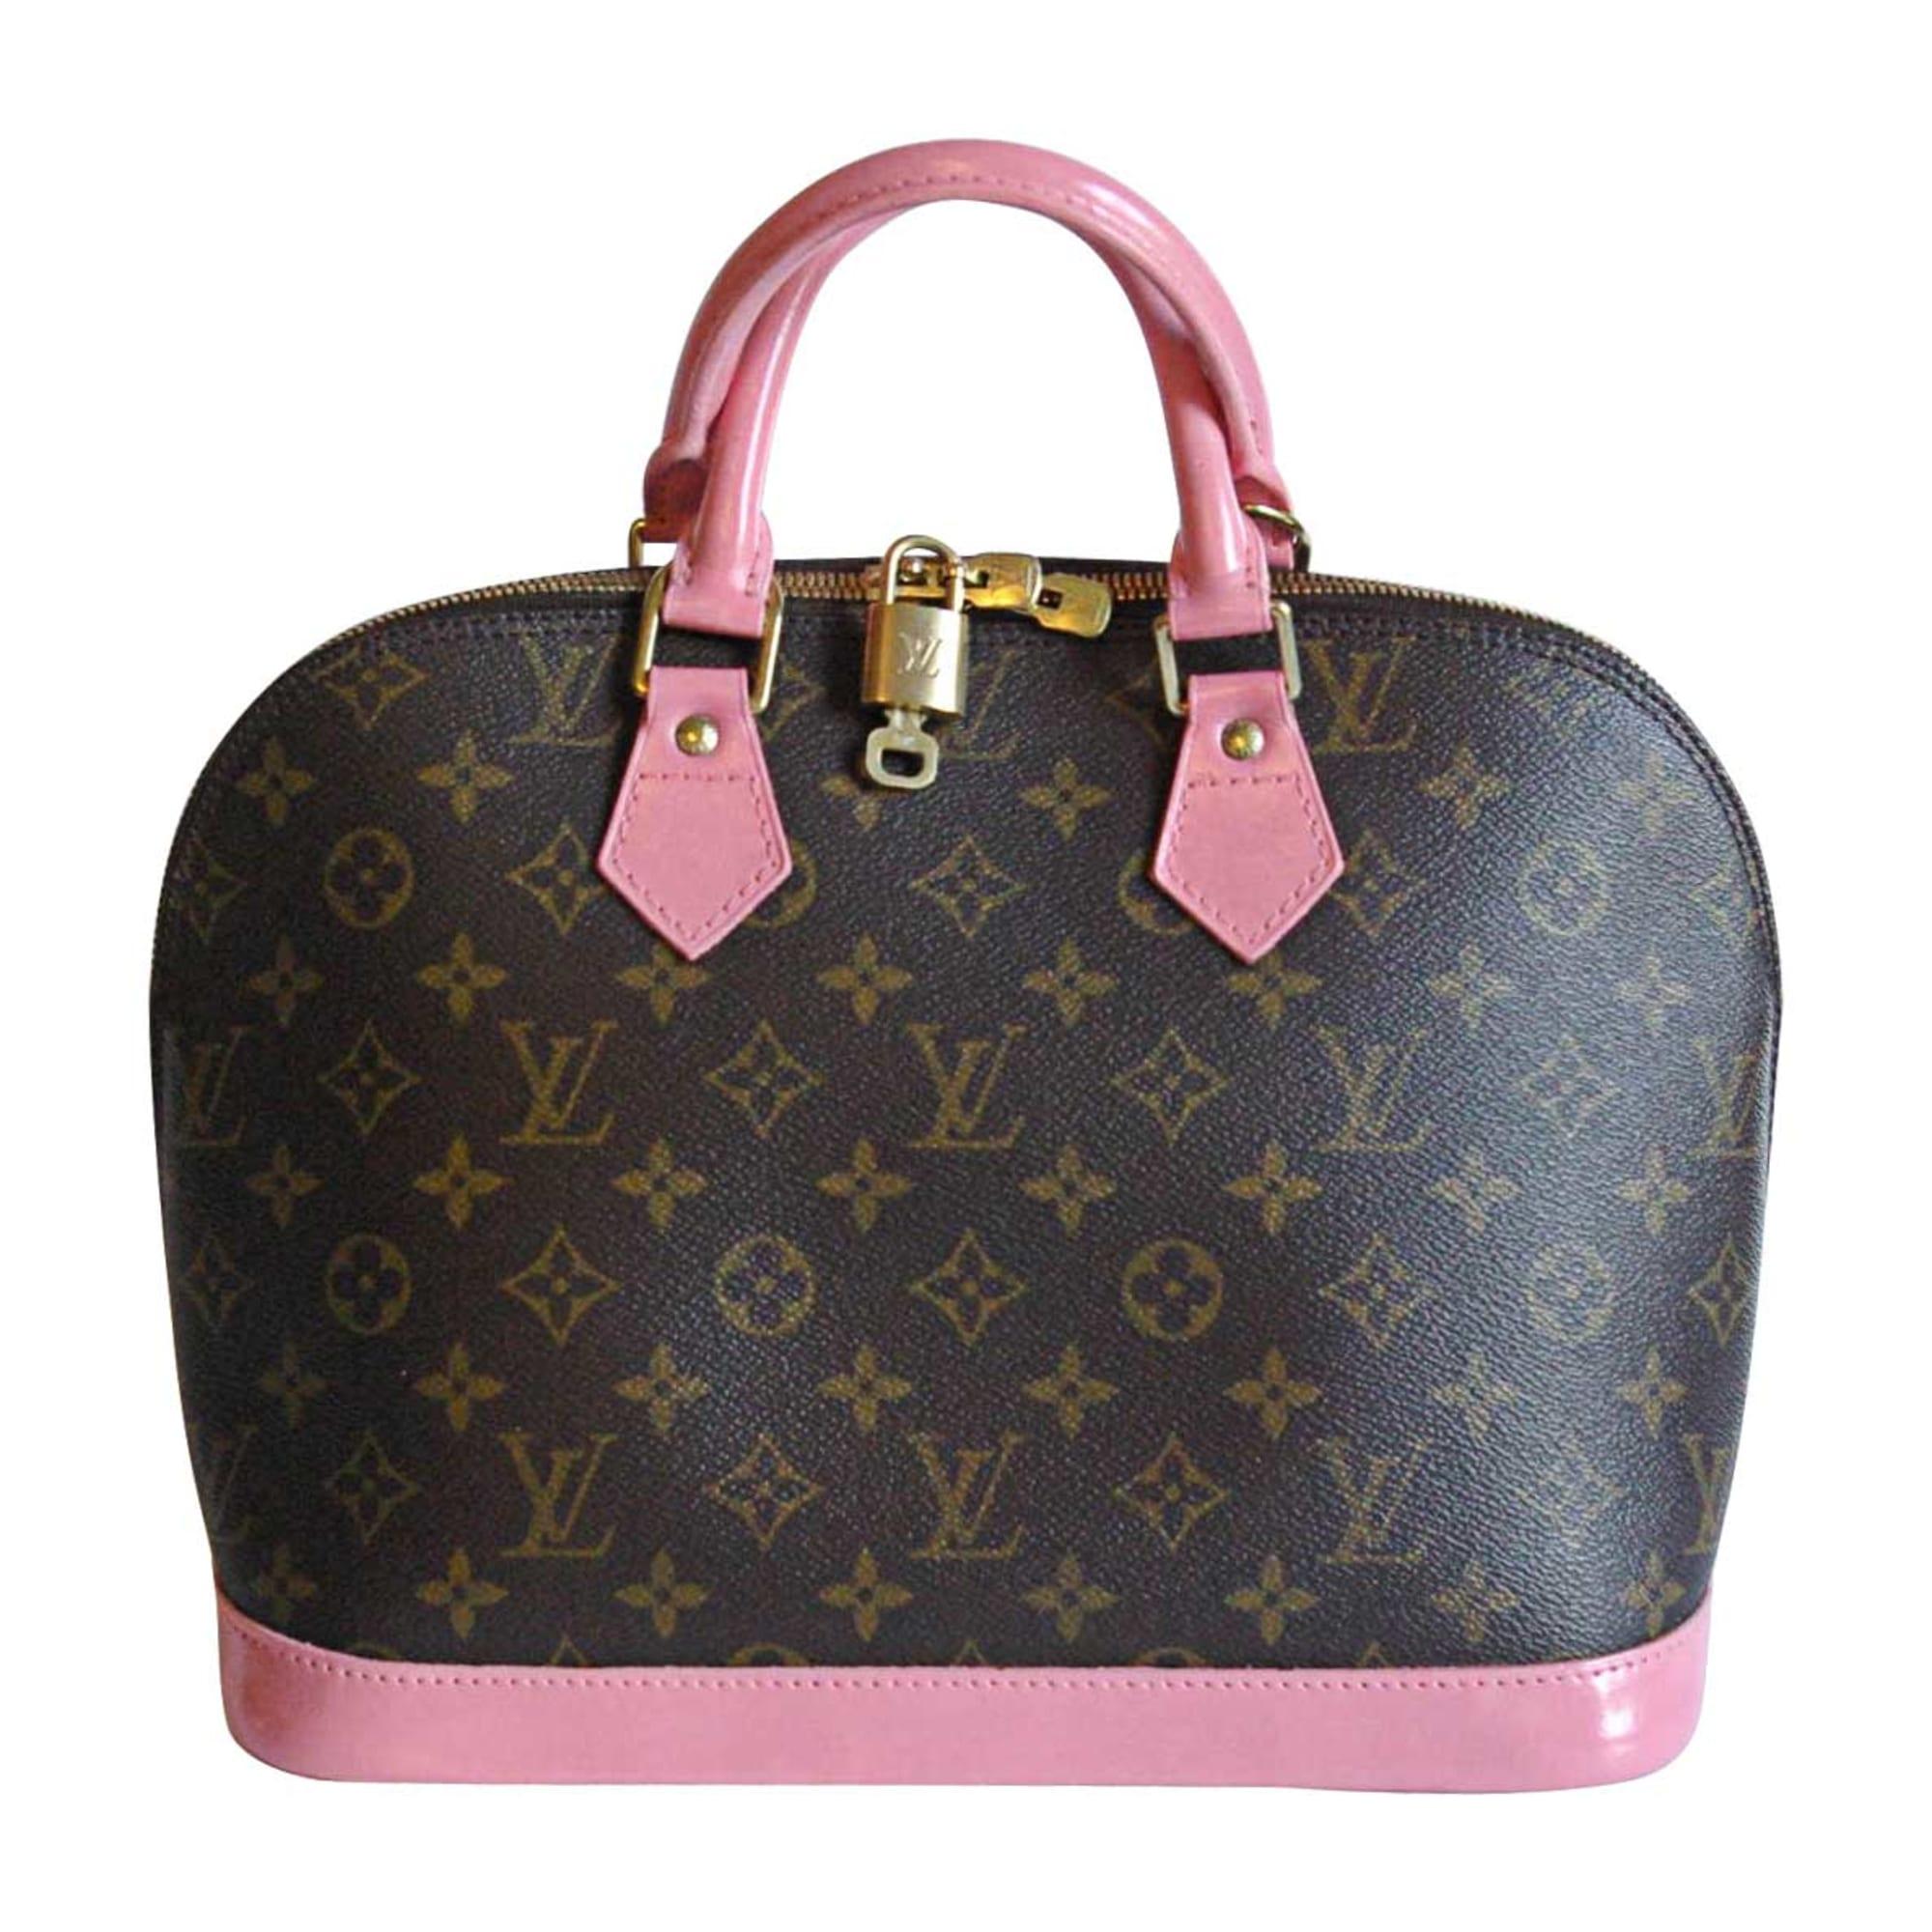 Shopping > sac rose louis vuitton, Up to 72% OFF